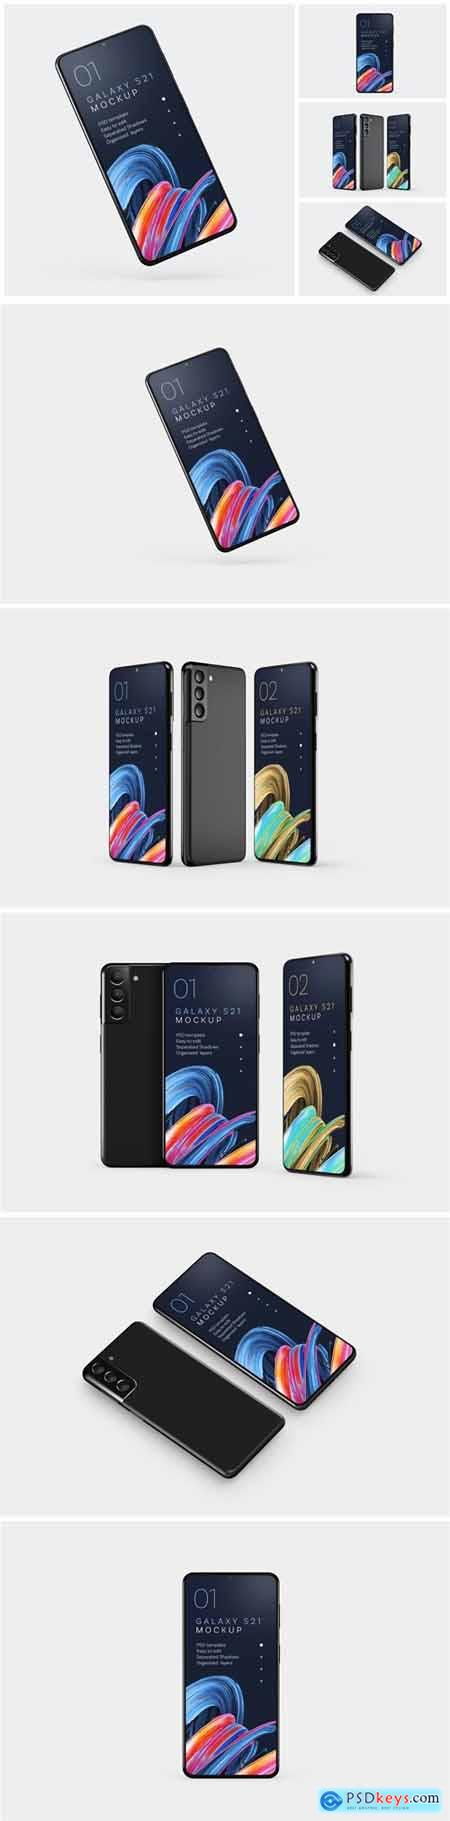 Galaxy S21 Mockup Set